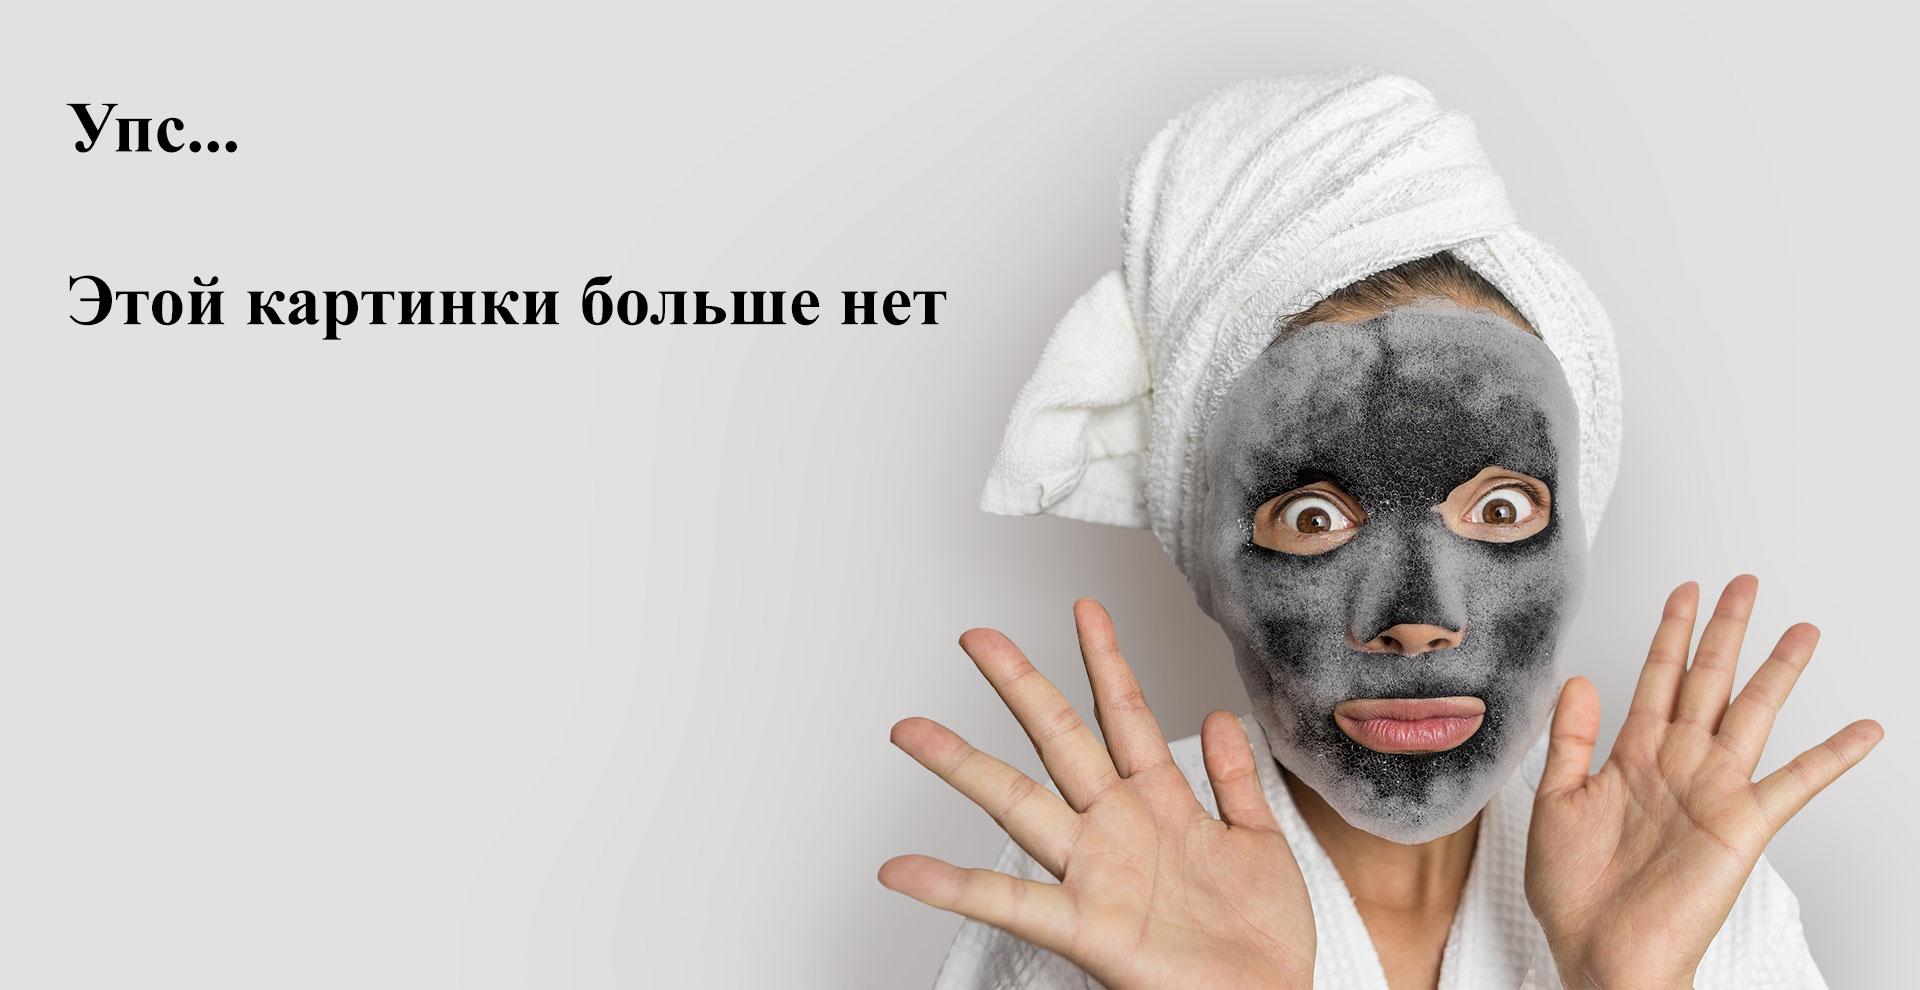 Vivienne Sabo, Губная помада Merci, тон 11